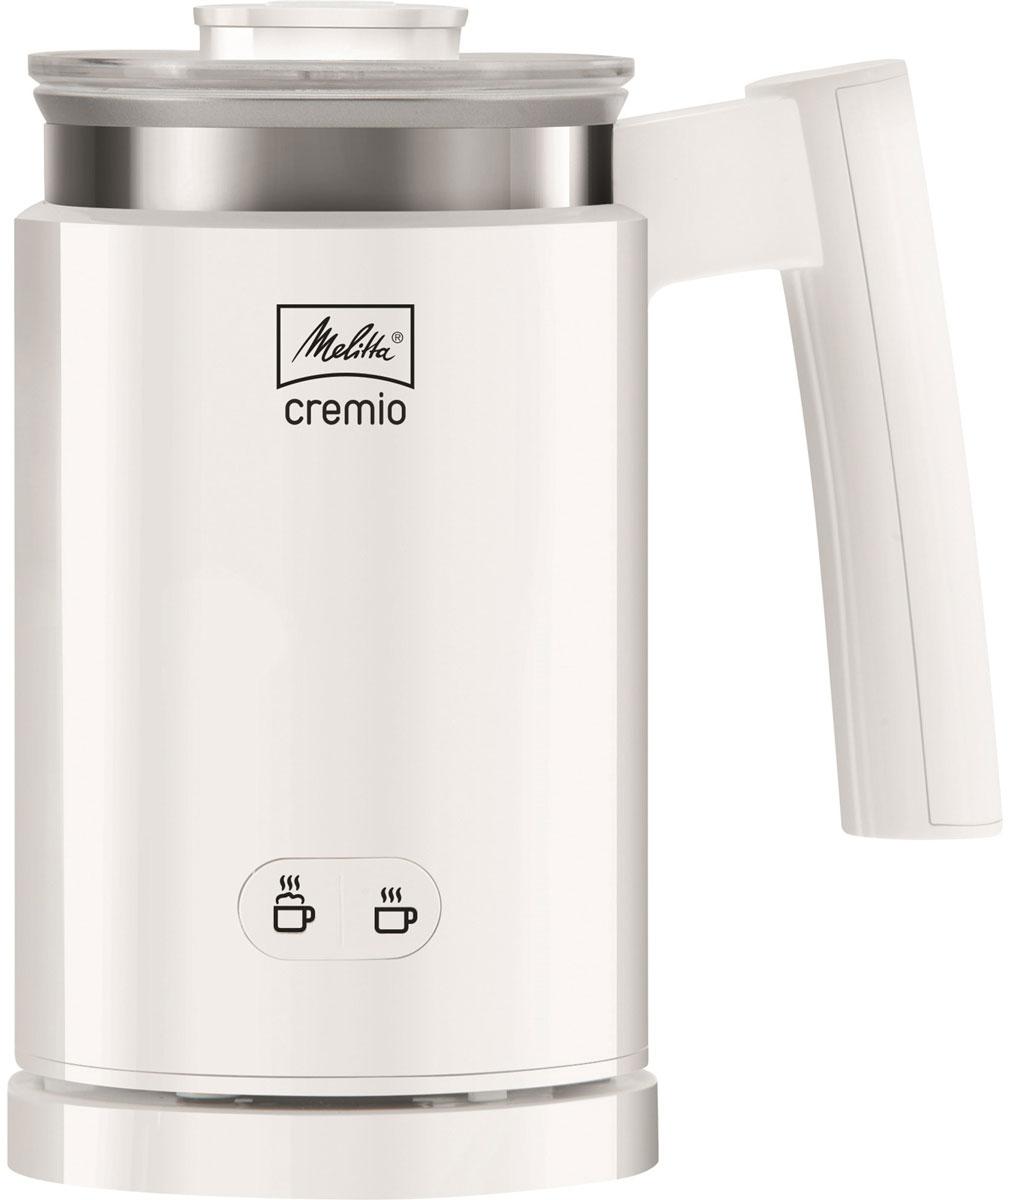 Melitta Cremio II, White капучинатор - Кофеварки и кофемашины